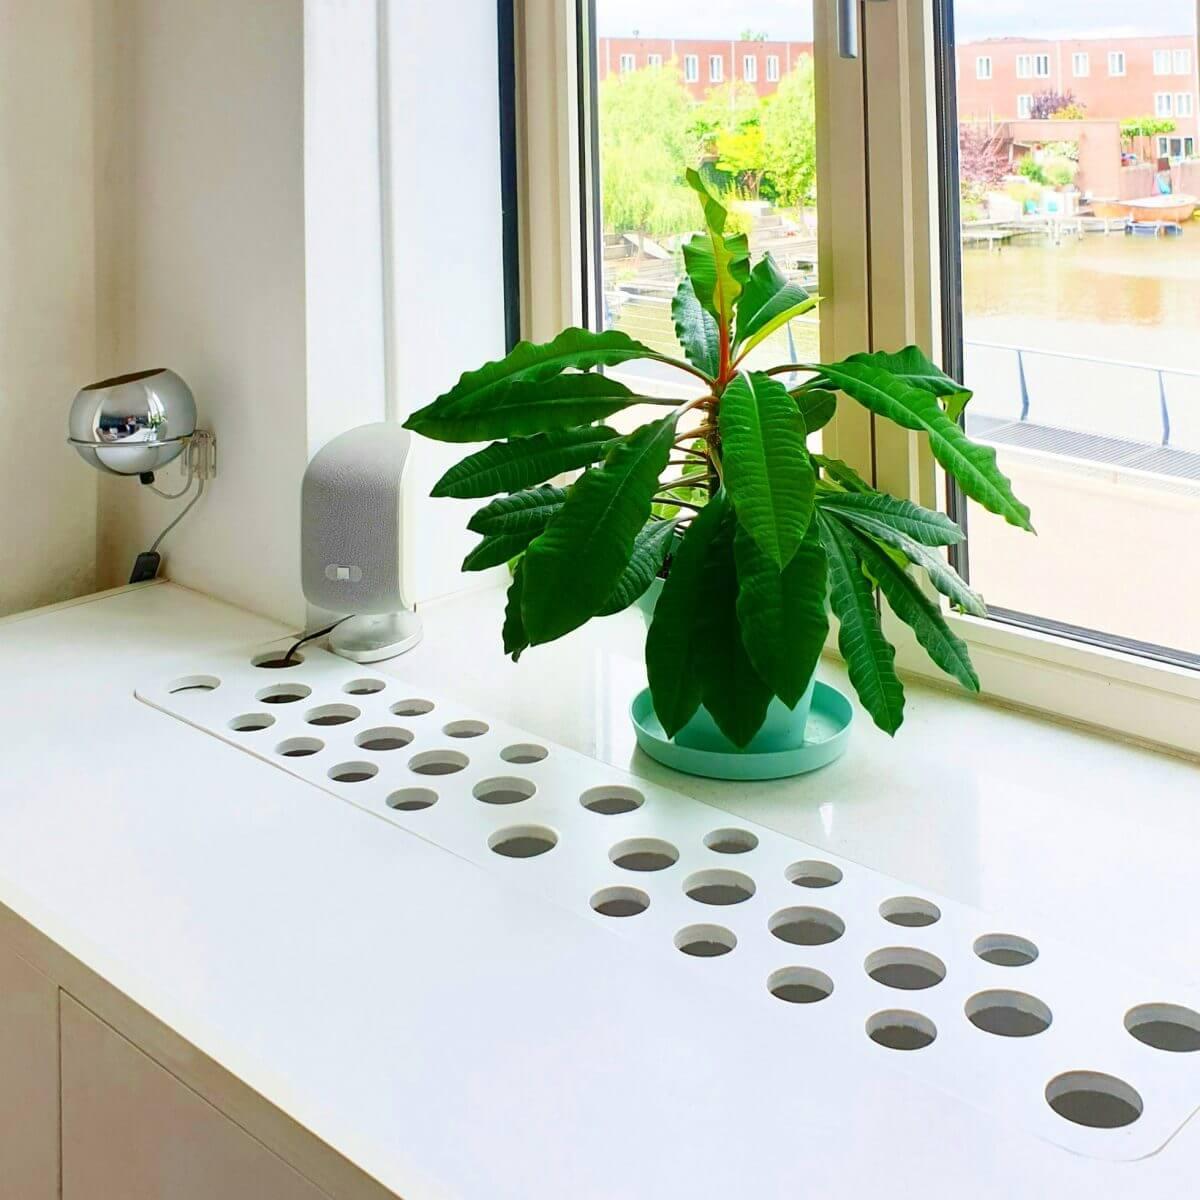 Ikea Hack: Eket verwarmingsombouw en dressoir. Eket heating conversion and sideboard dresser cupboard met luchtgaten